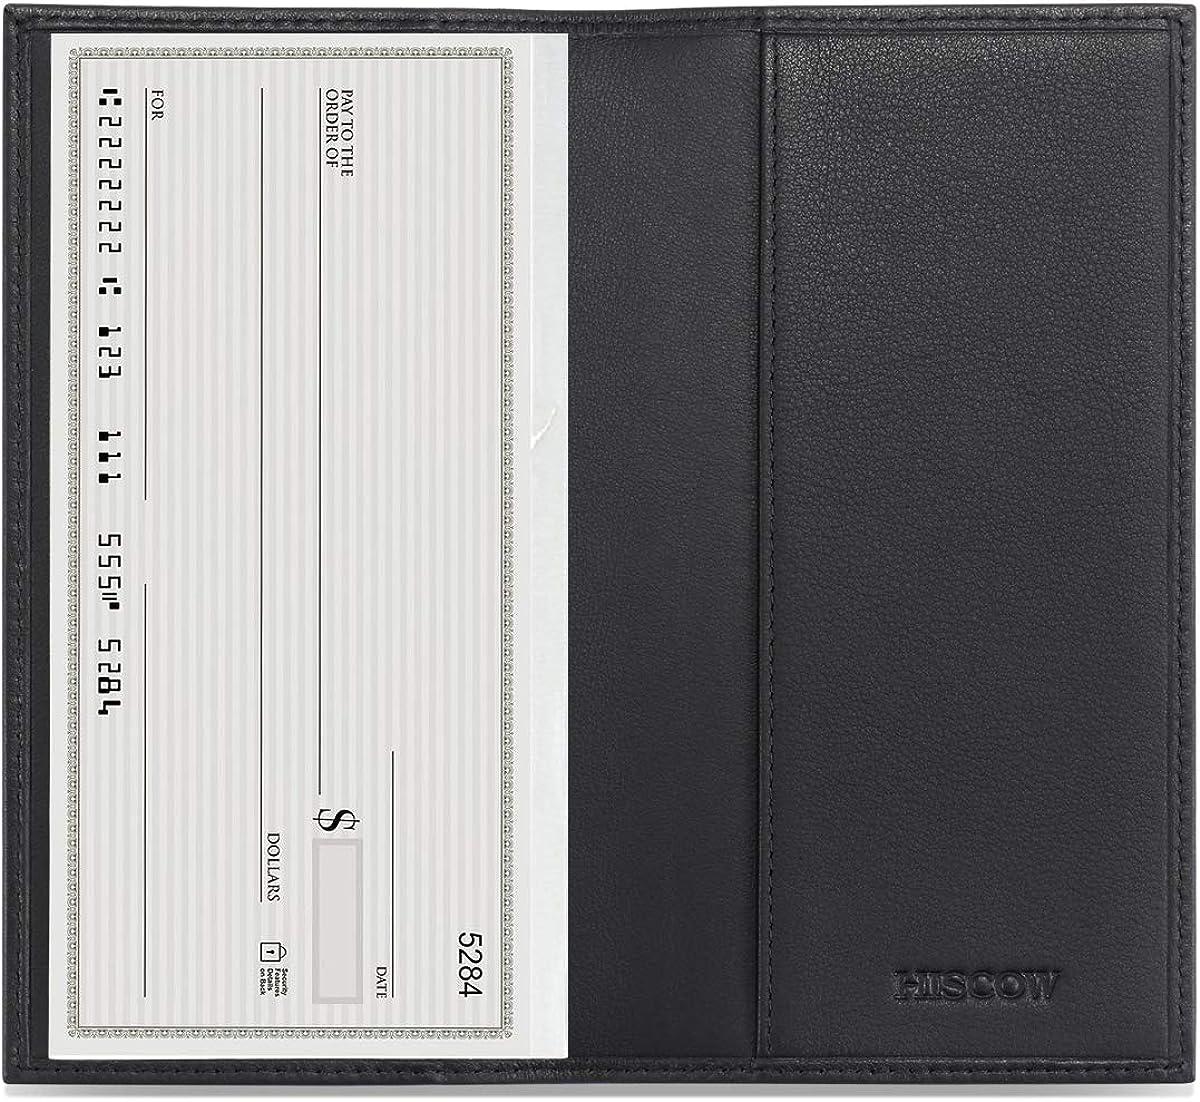 Full Grain Leather HISCOW Minimalist Checkbook Cover